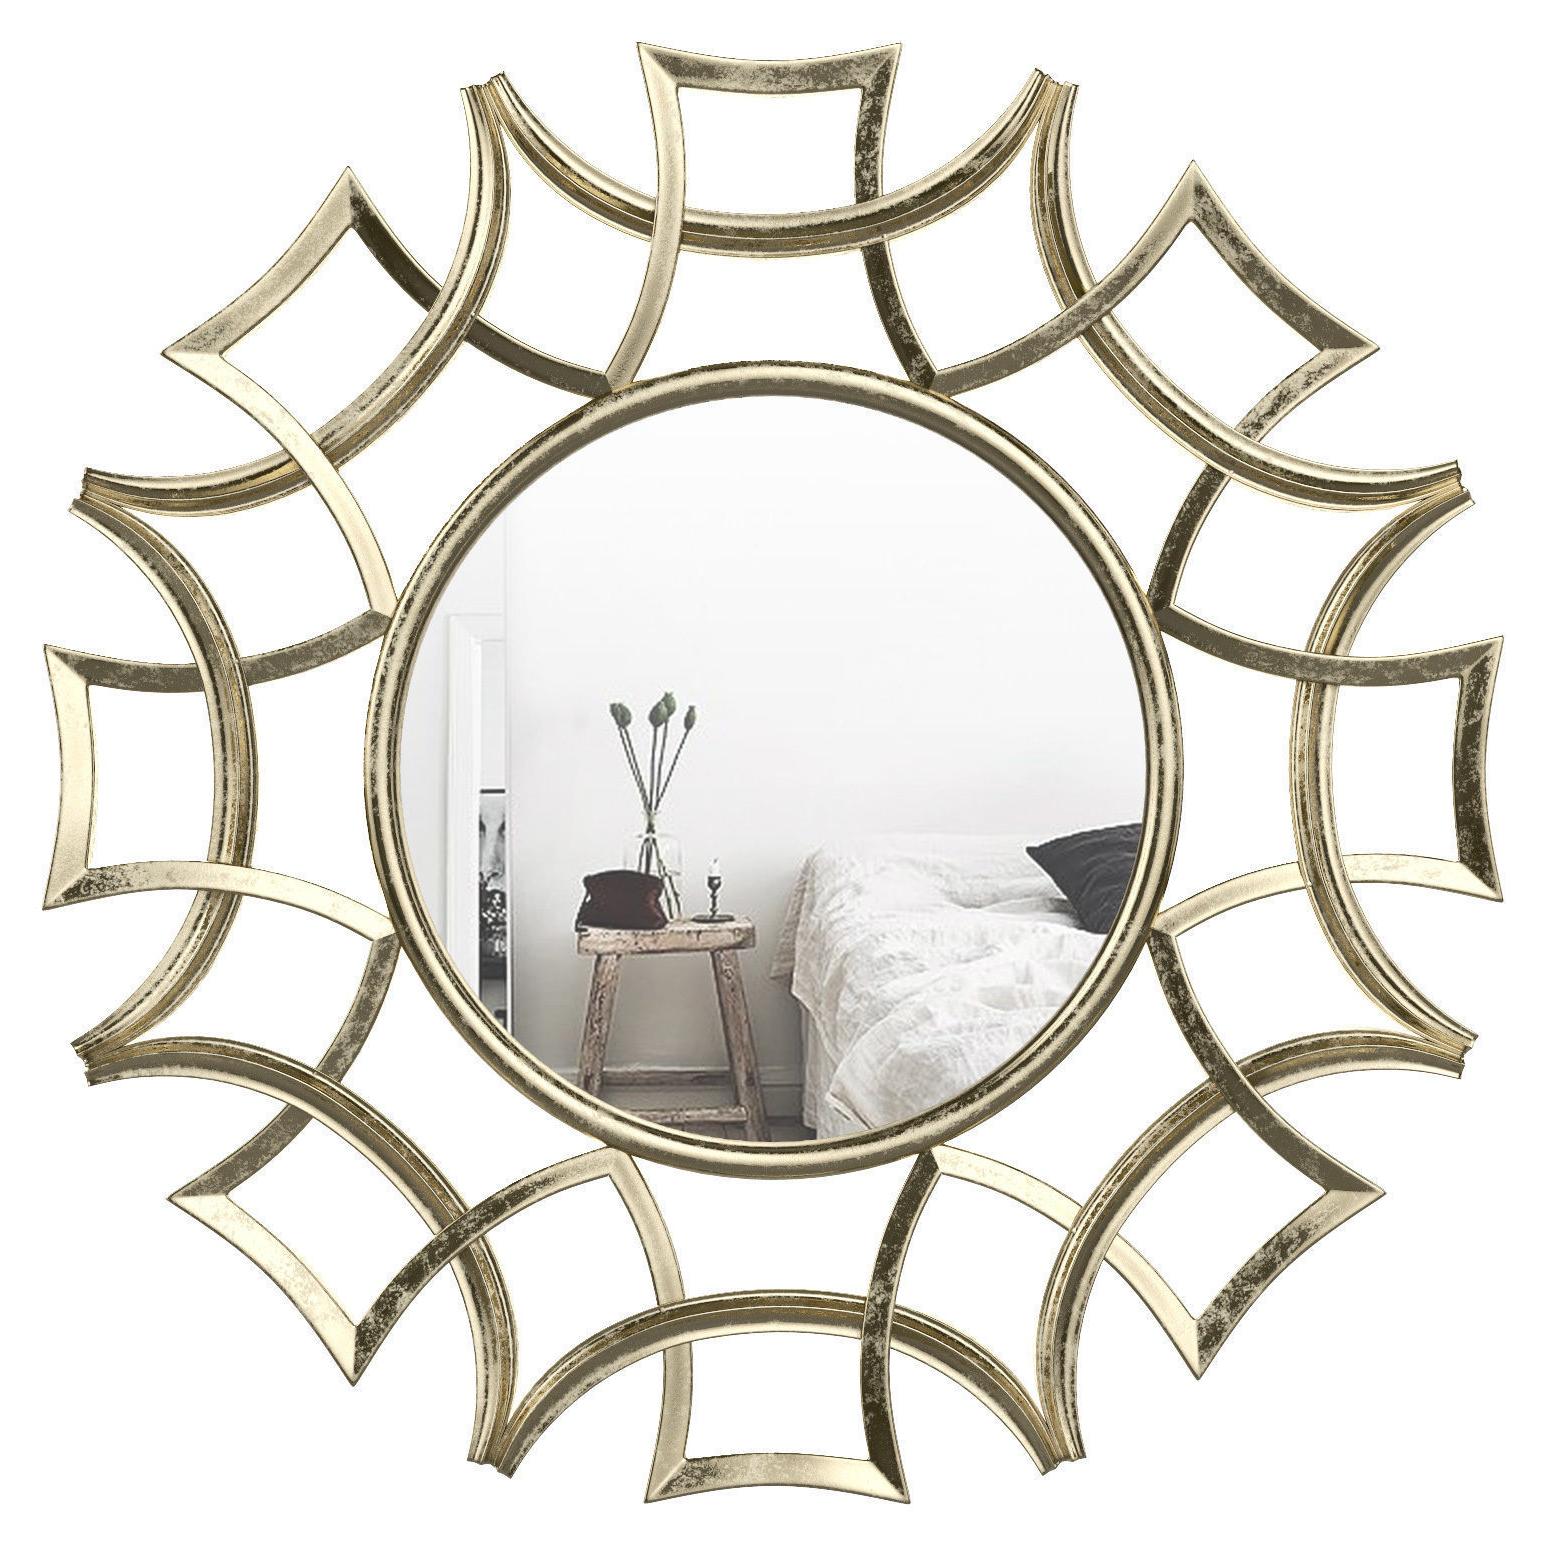 Preferred Brylee Traditional Sunburst Mirror Wrlo (View 2 of 20)